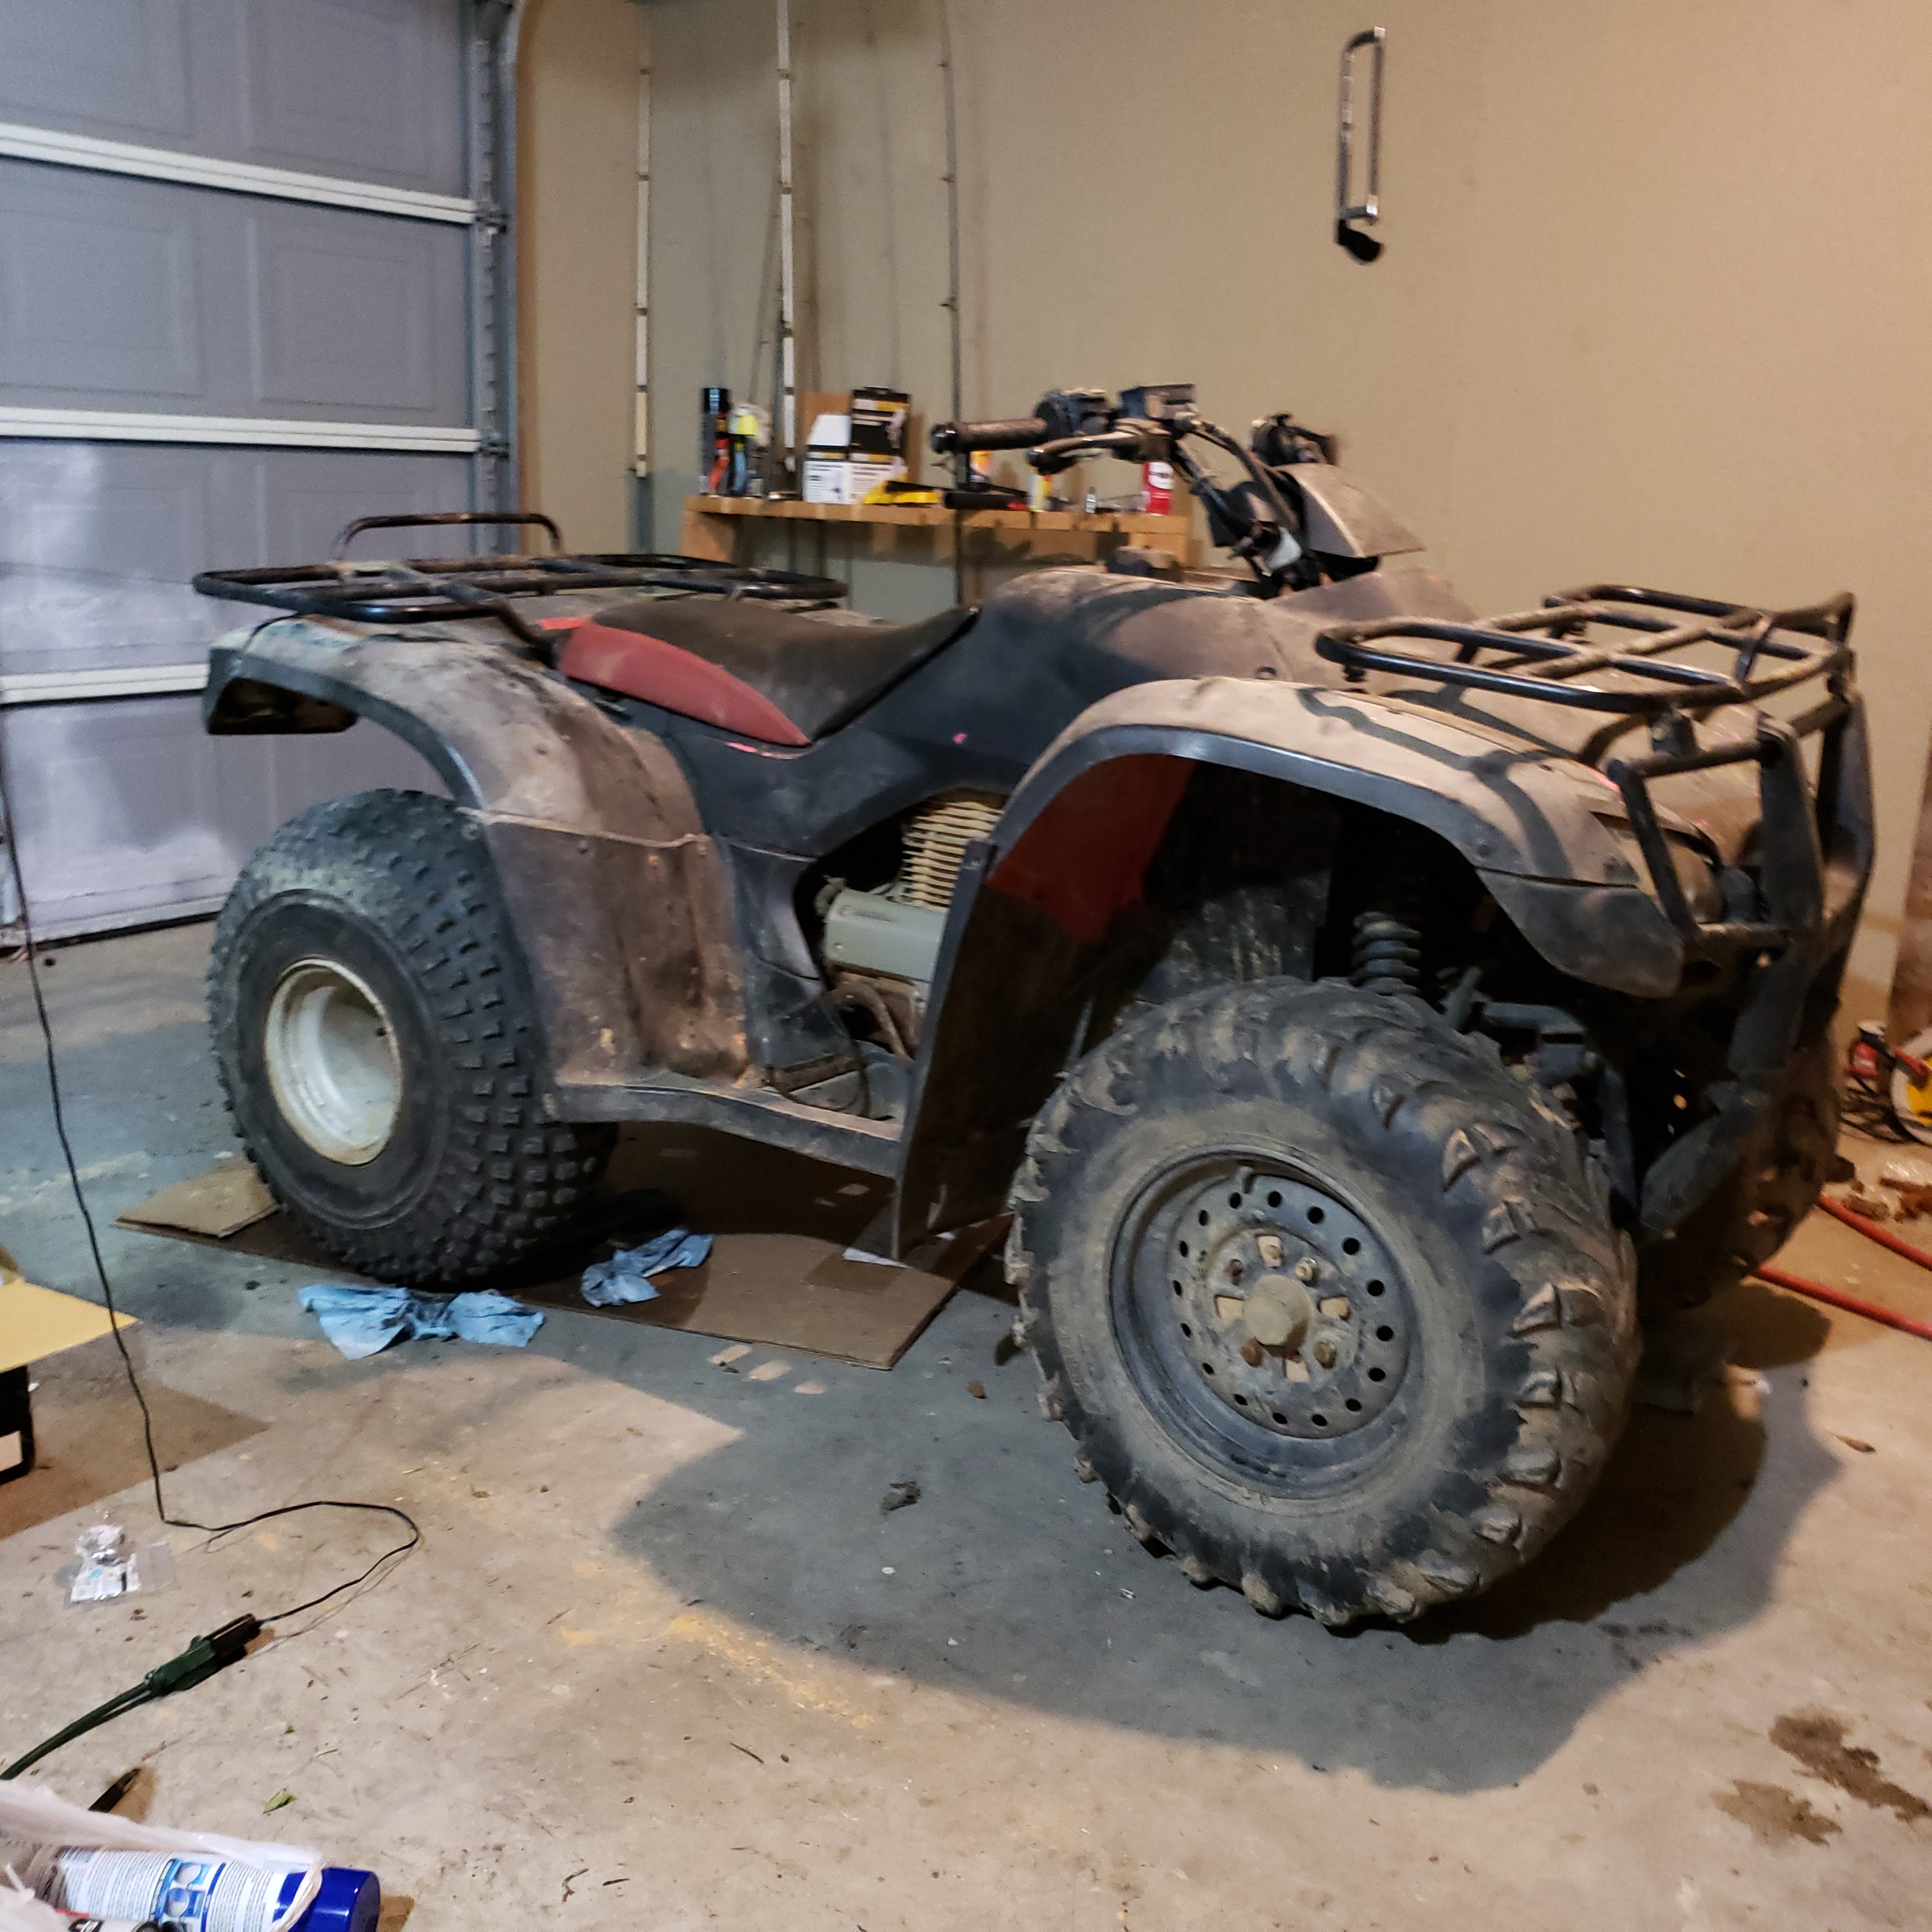 2005 Honda rancher 350 4x4 front drive shaft help-20190430_022928_1557504914631.jpg